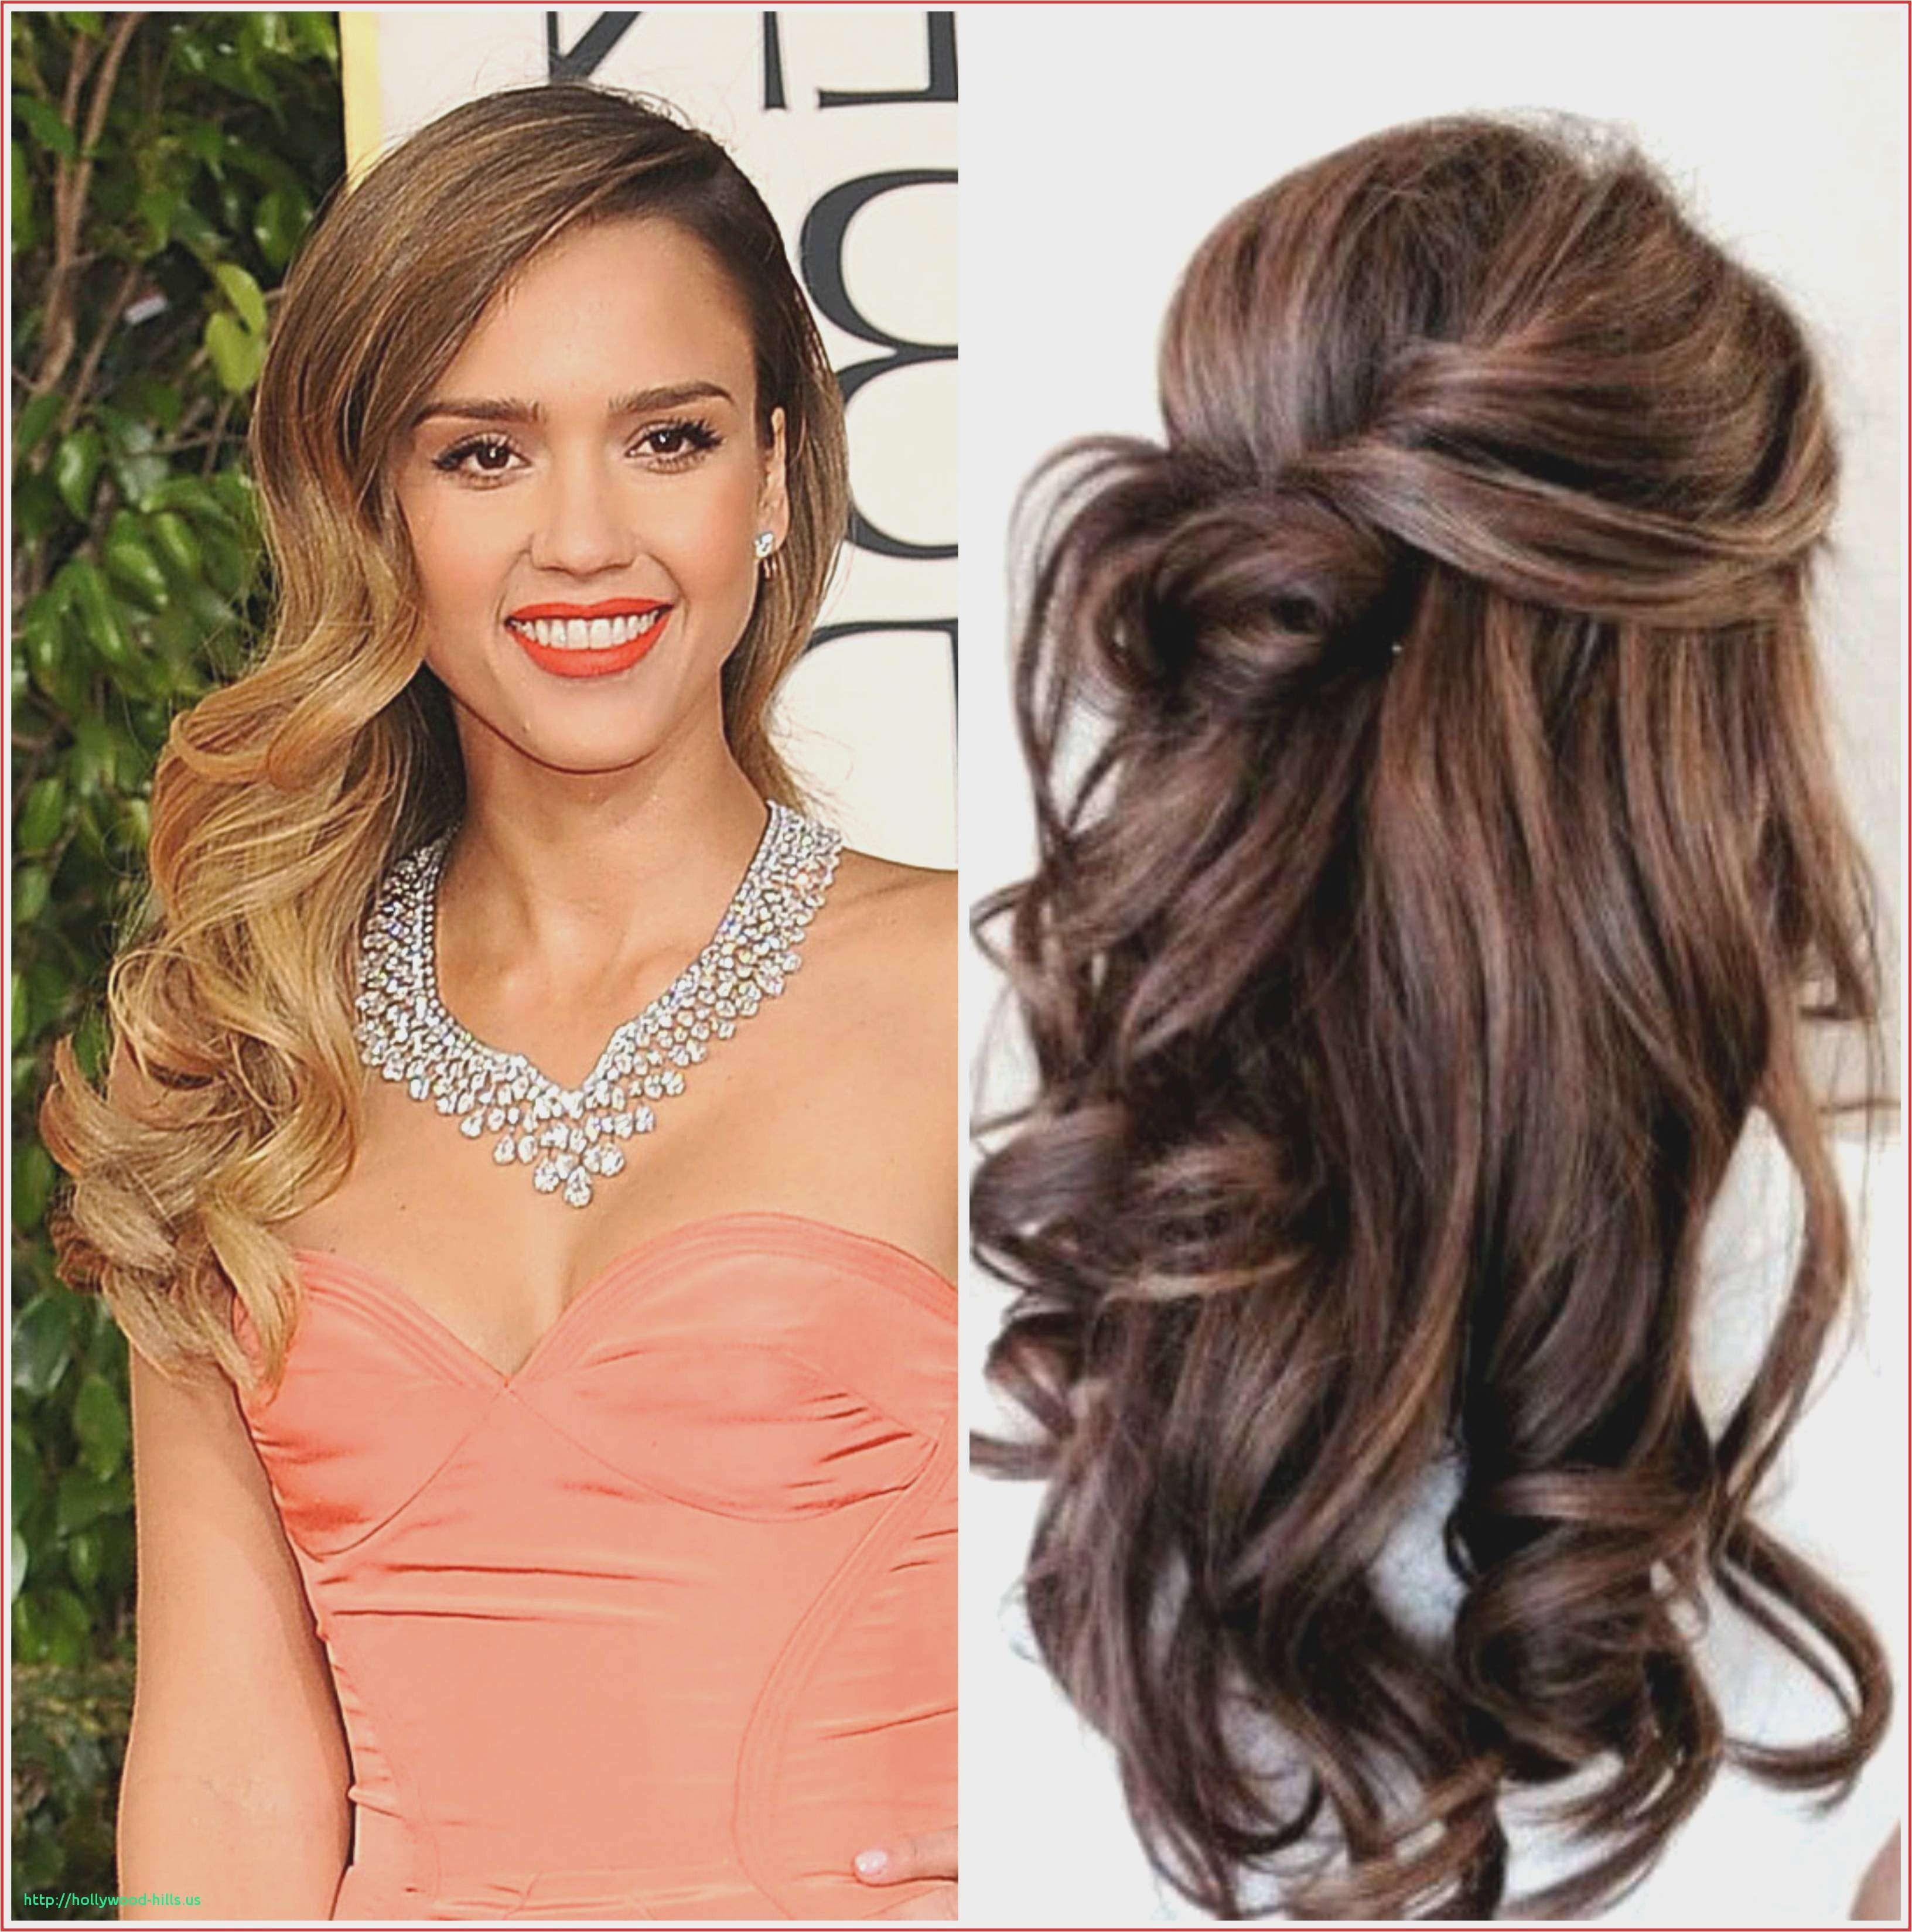 Cute Hairstyles for Long Hair Easy Inspirational Easy and Cute Hairstyles for Tweens